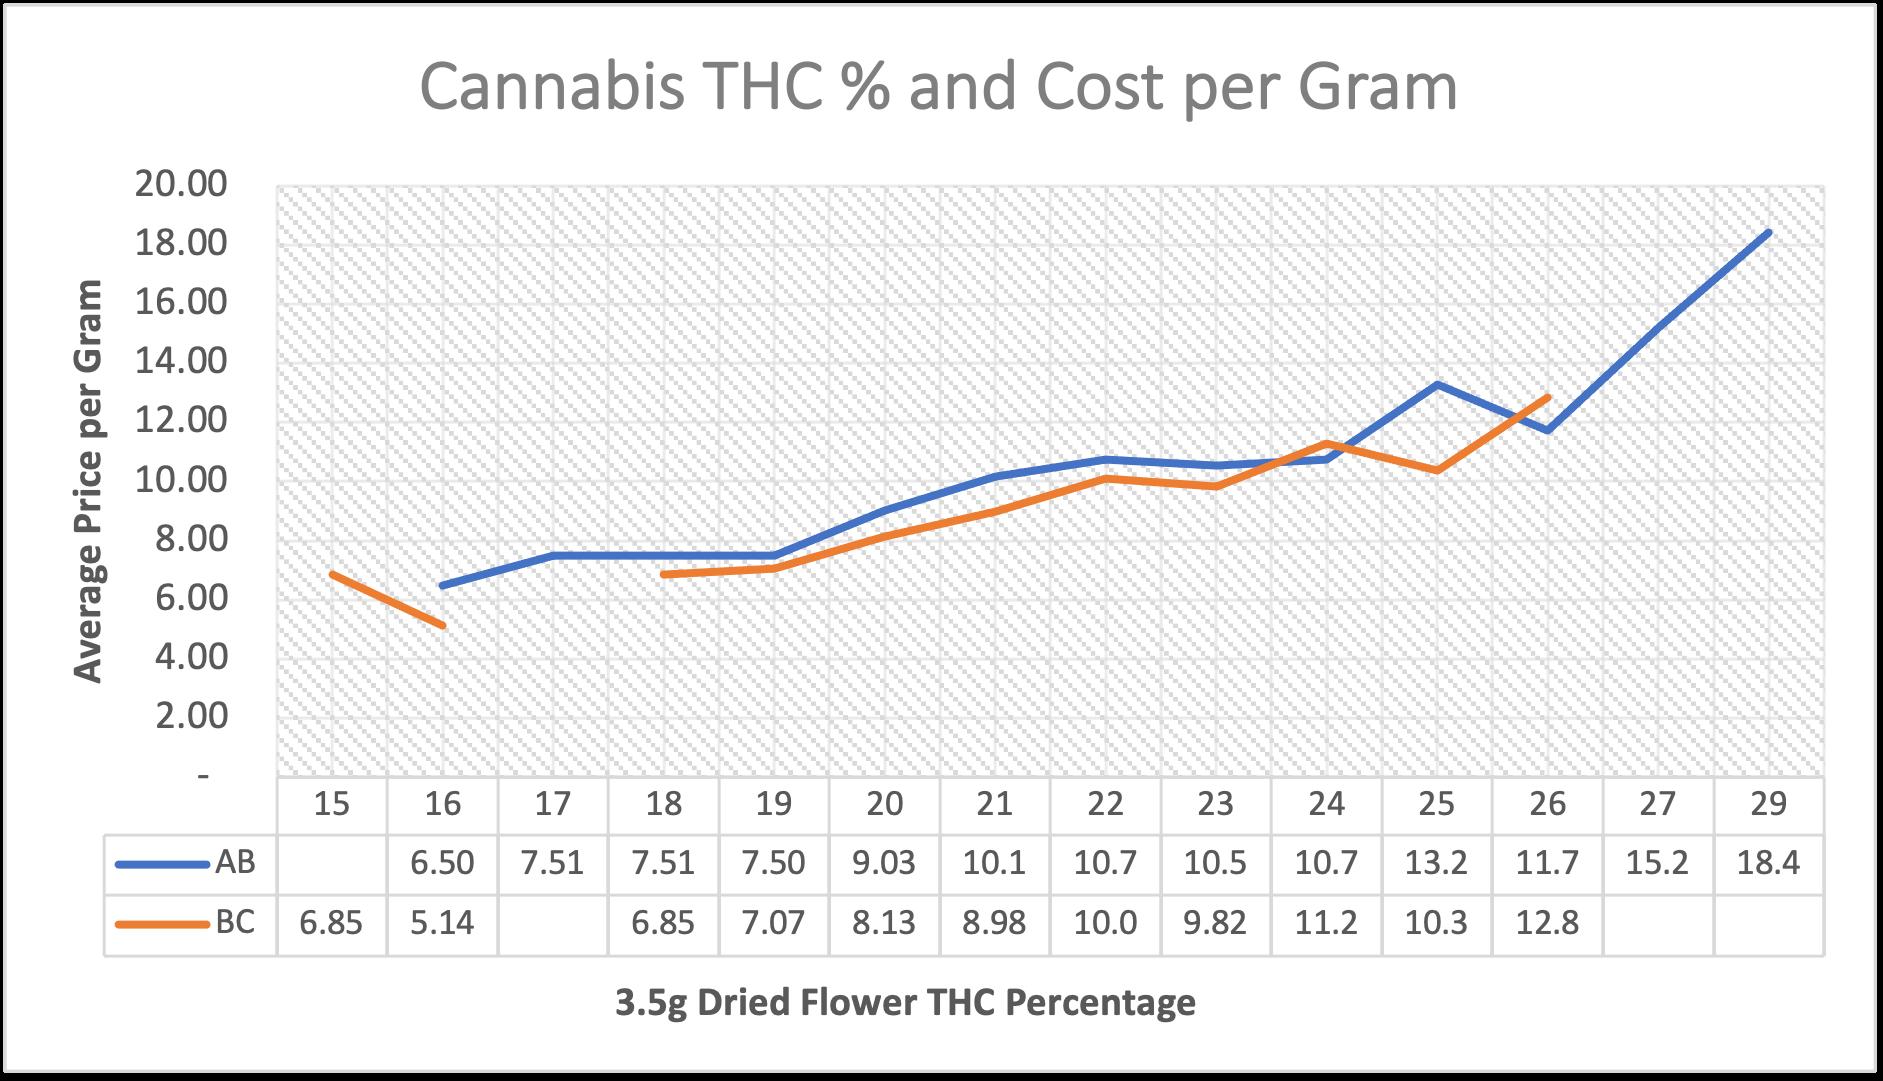 BC and AB THC% Cost per gram